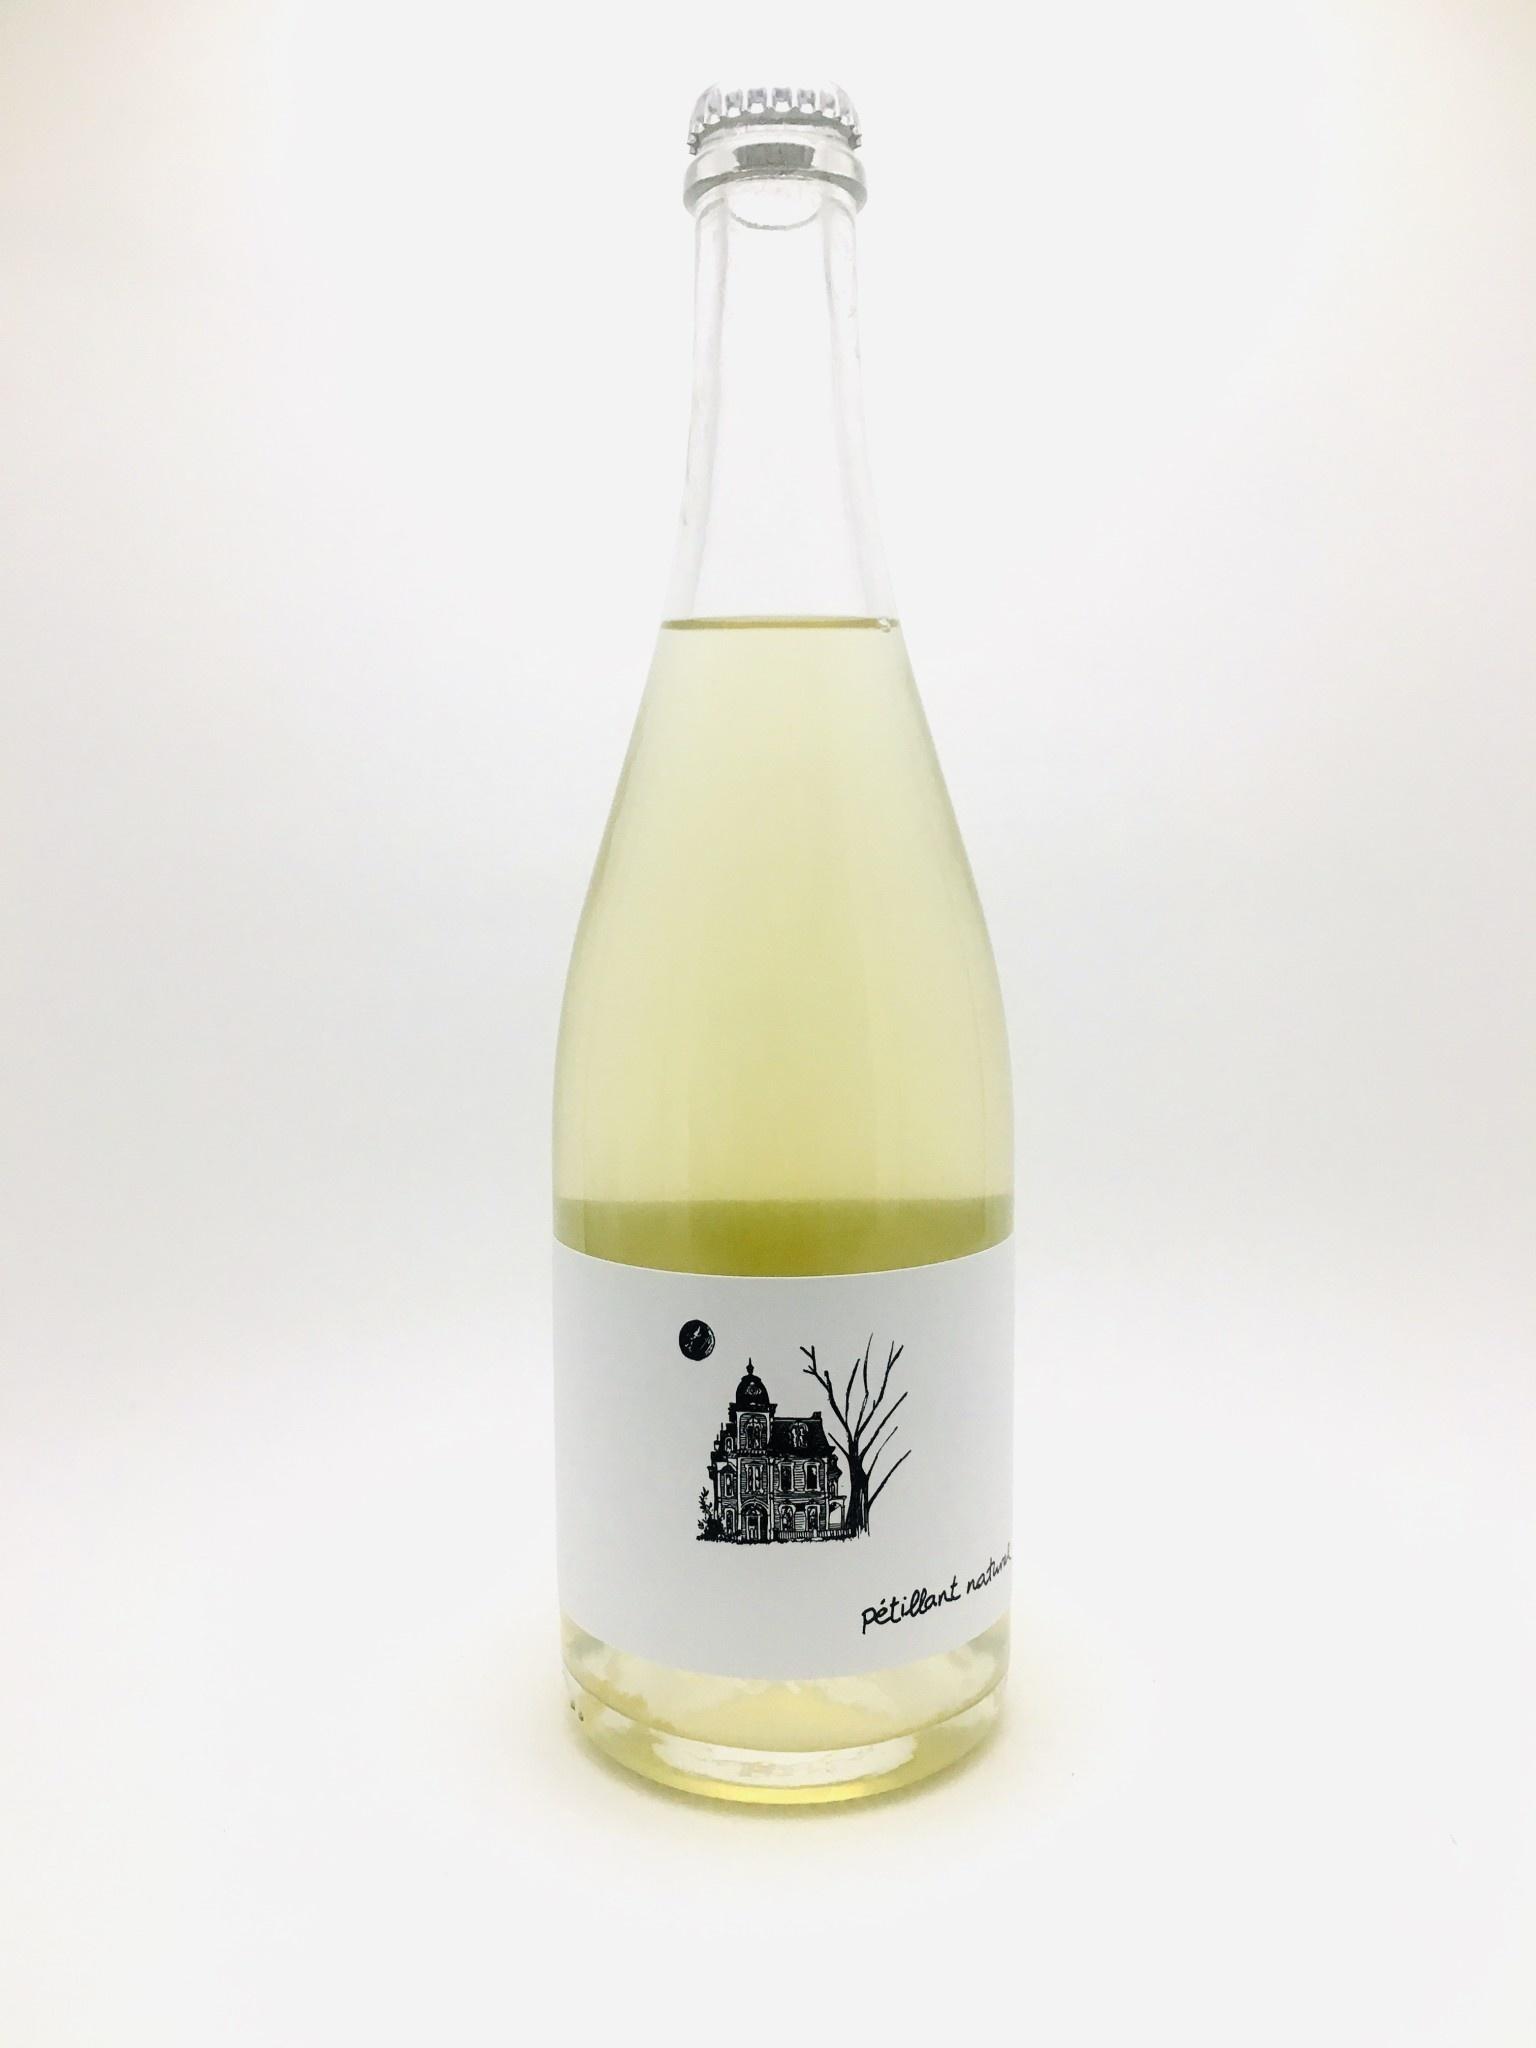 Early Mountain Pet Nat (Naturally Sparkling) Blanc Malvasia Bianca Virginia 2020